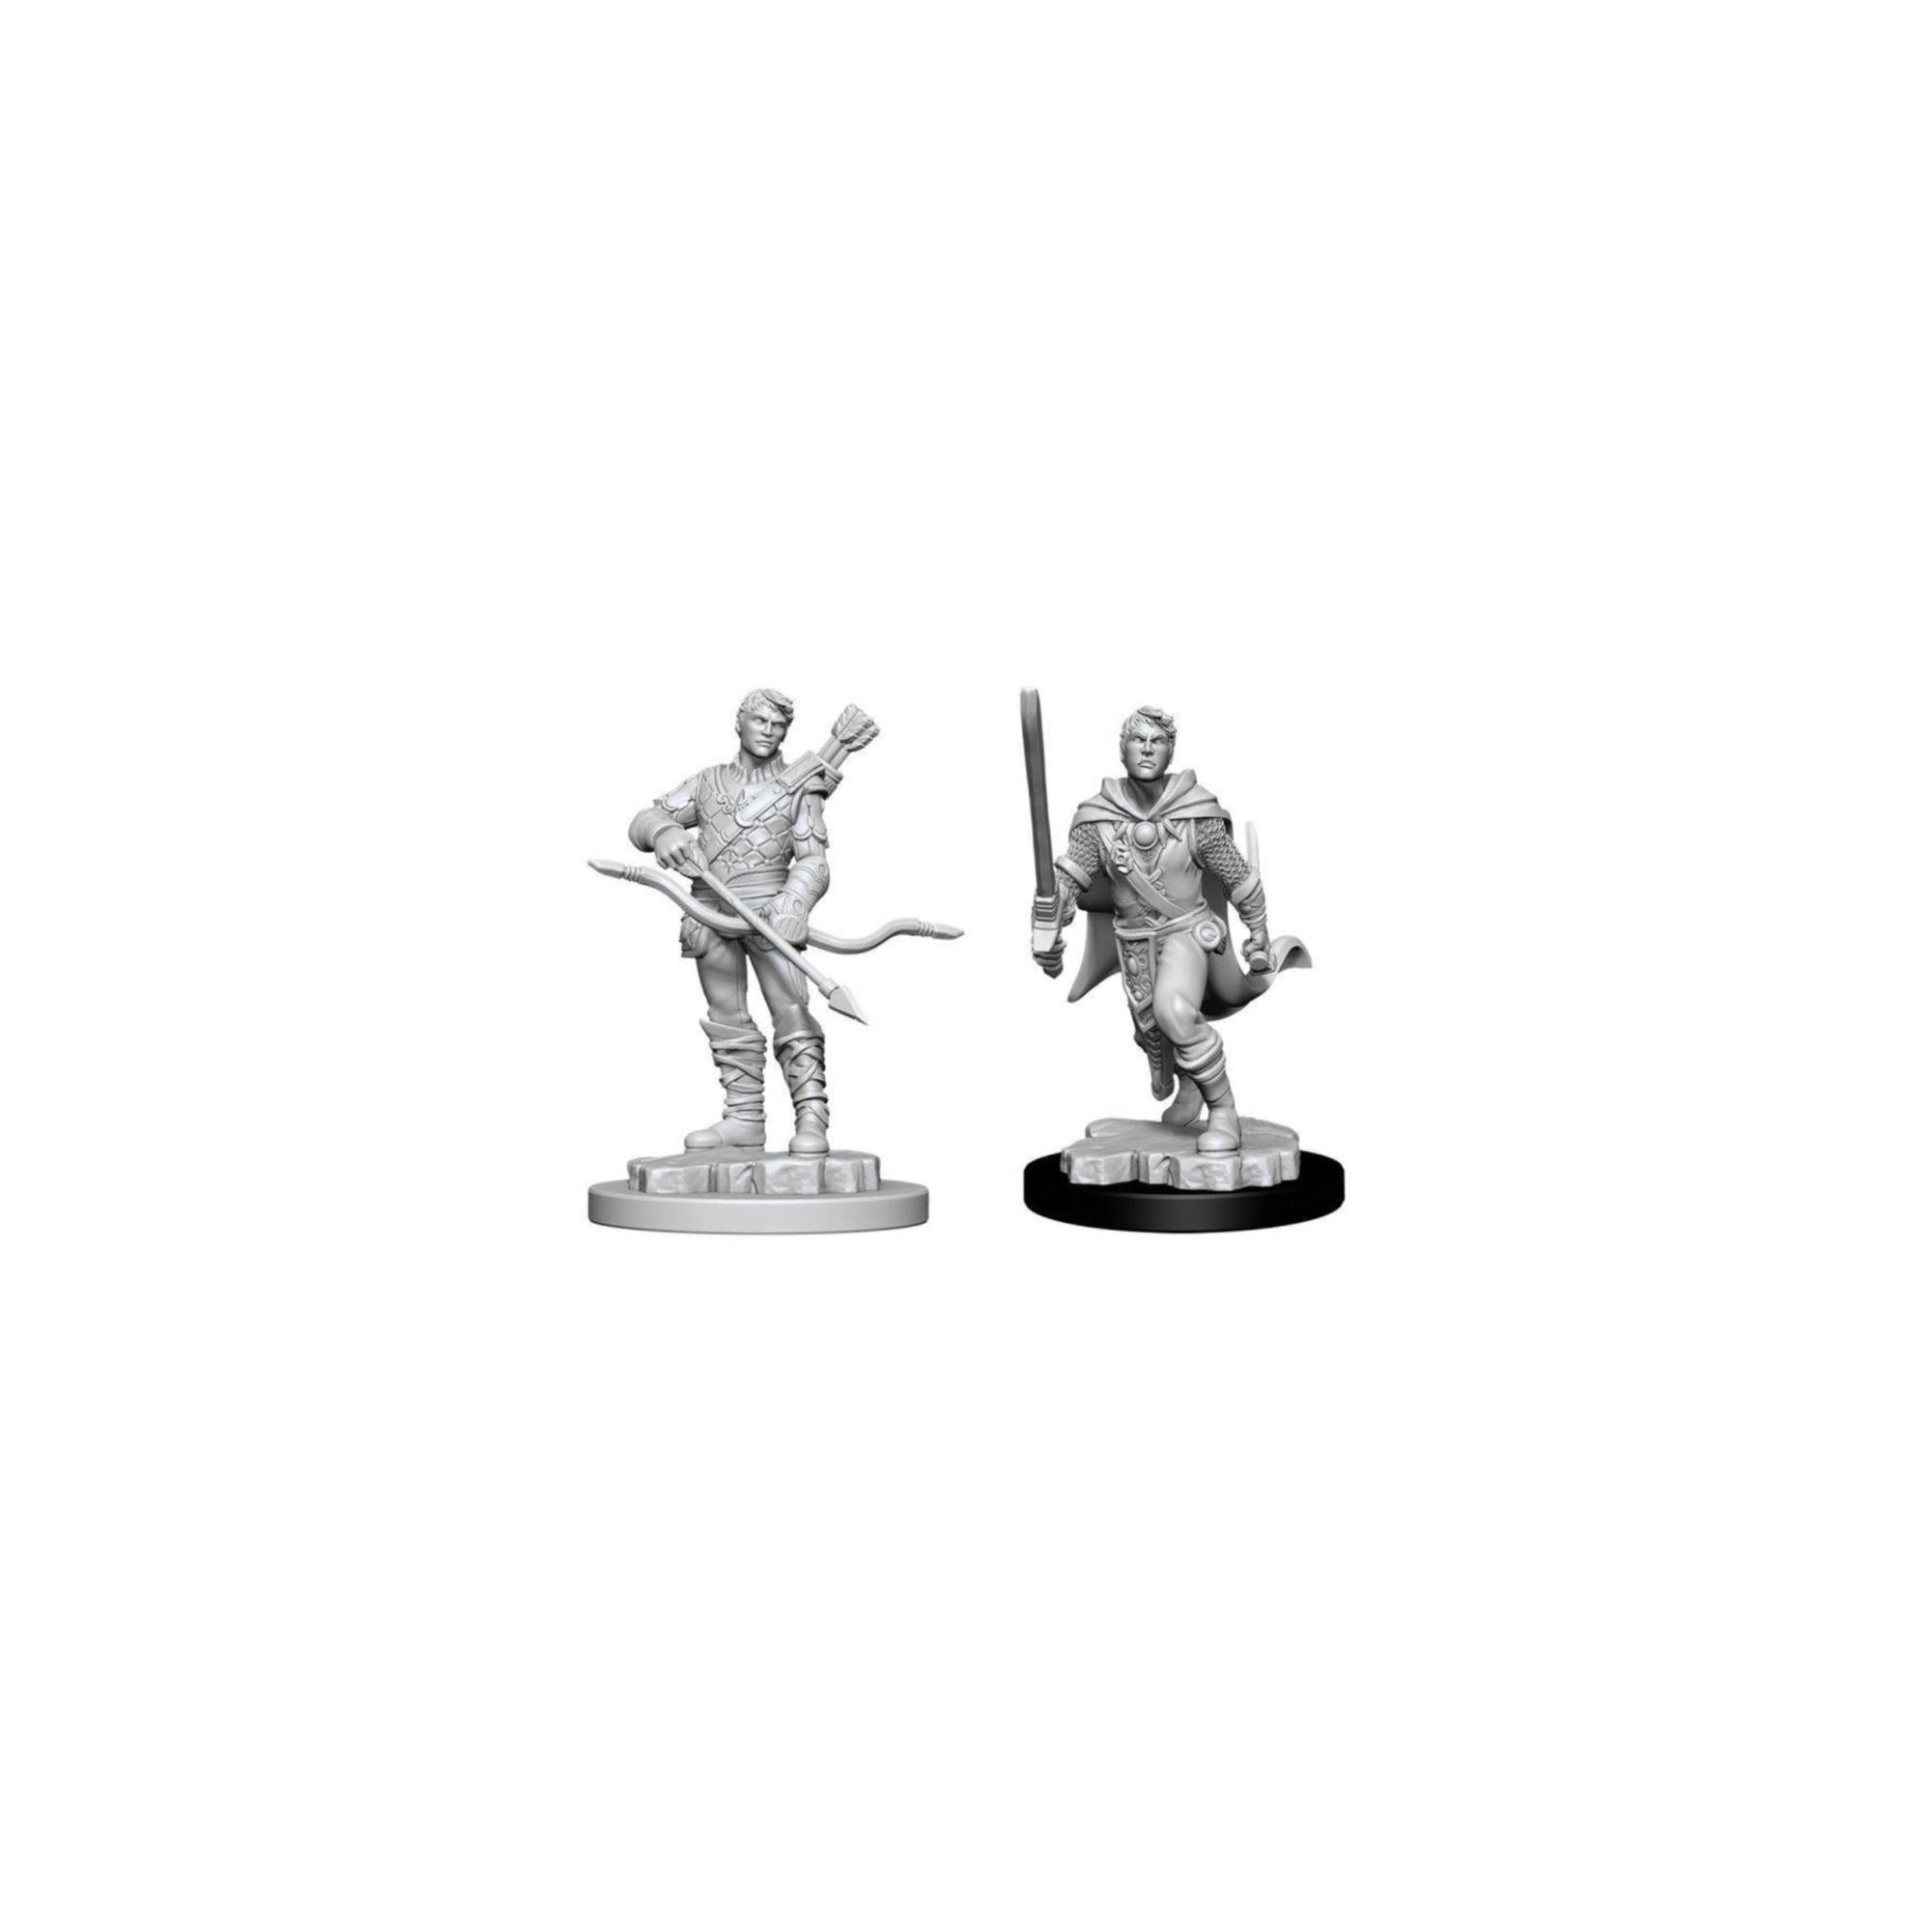 Wizkids Games D&D Dungeons & Dragons: Unpainted Minis WV11 Male Human Ranger